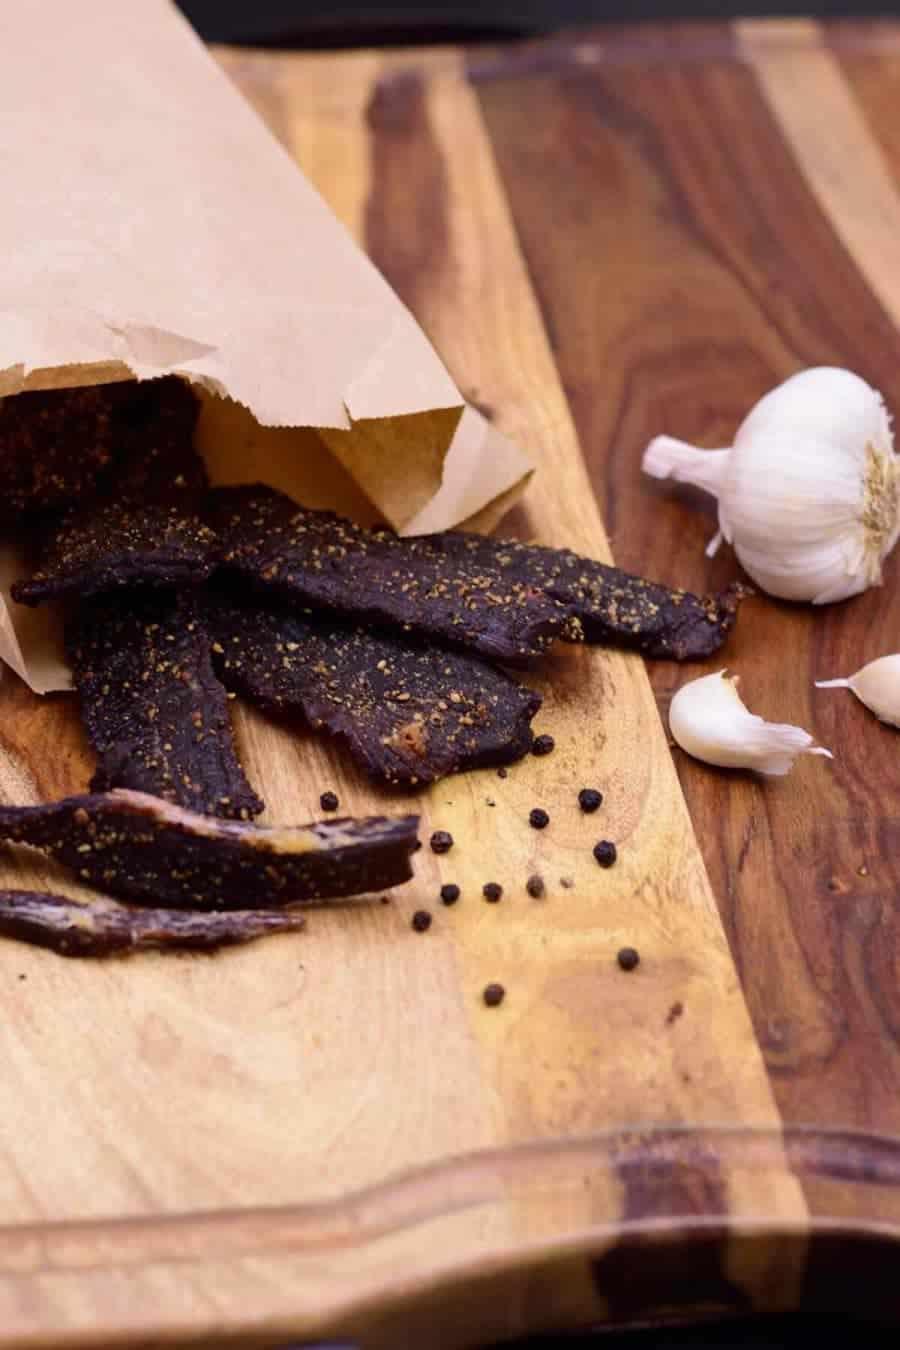 Garlic black pepper beef jerky on cutting board with black peppercorns and garlic